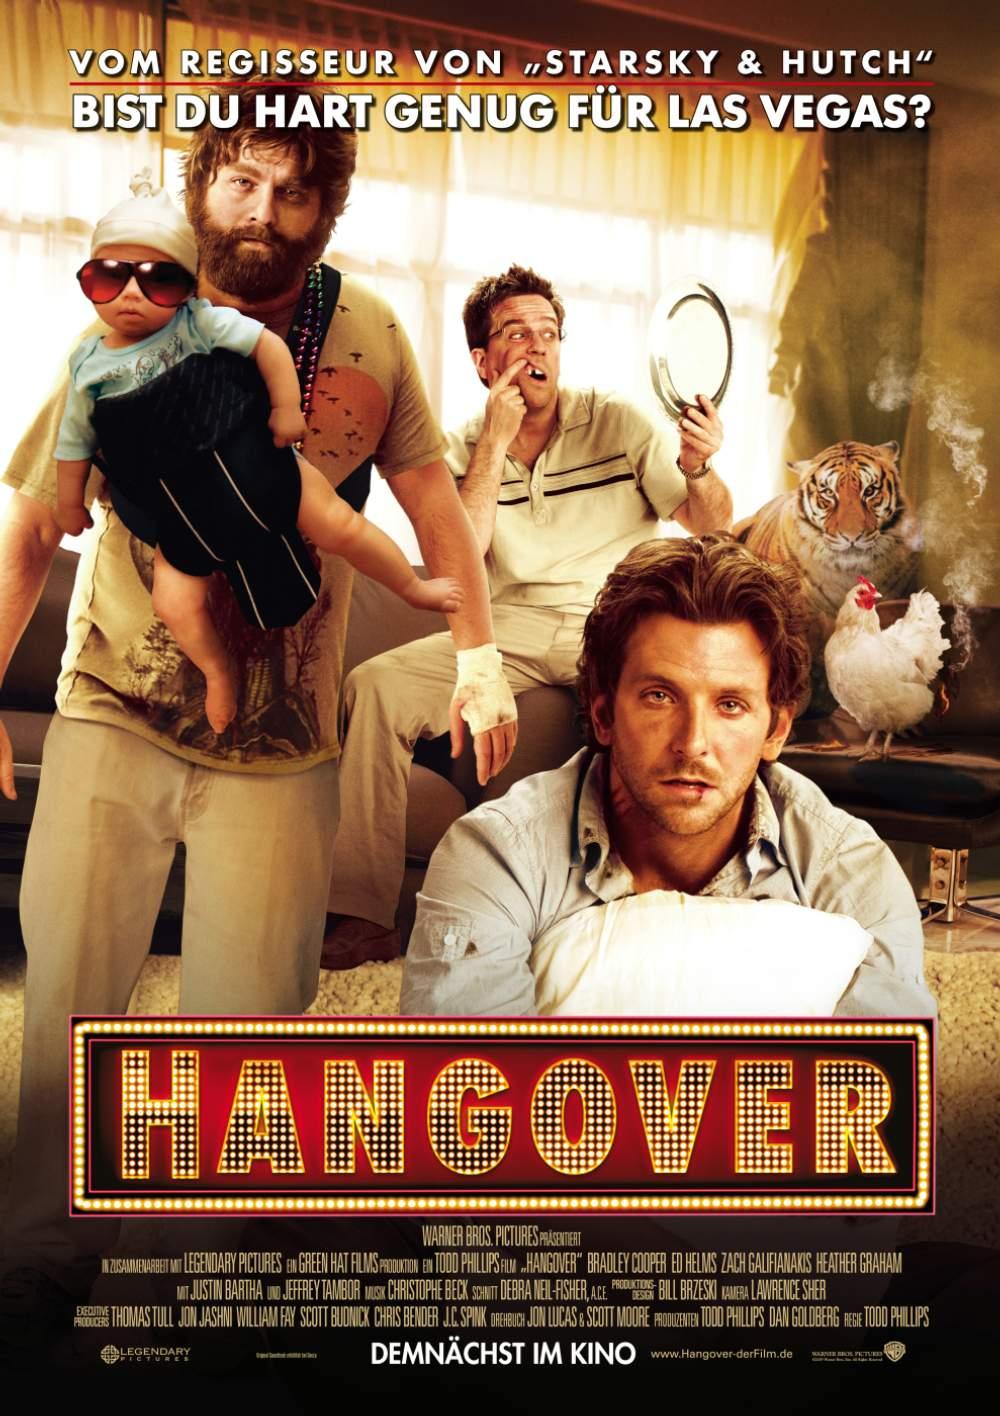 Hangover, Autokino 2010